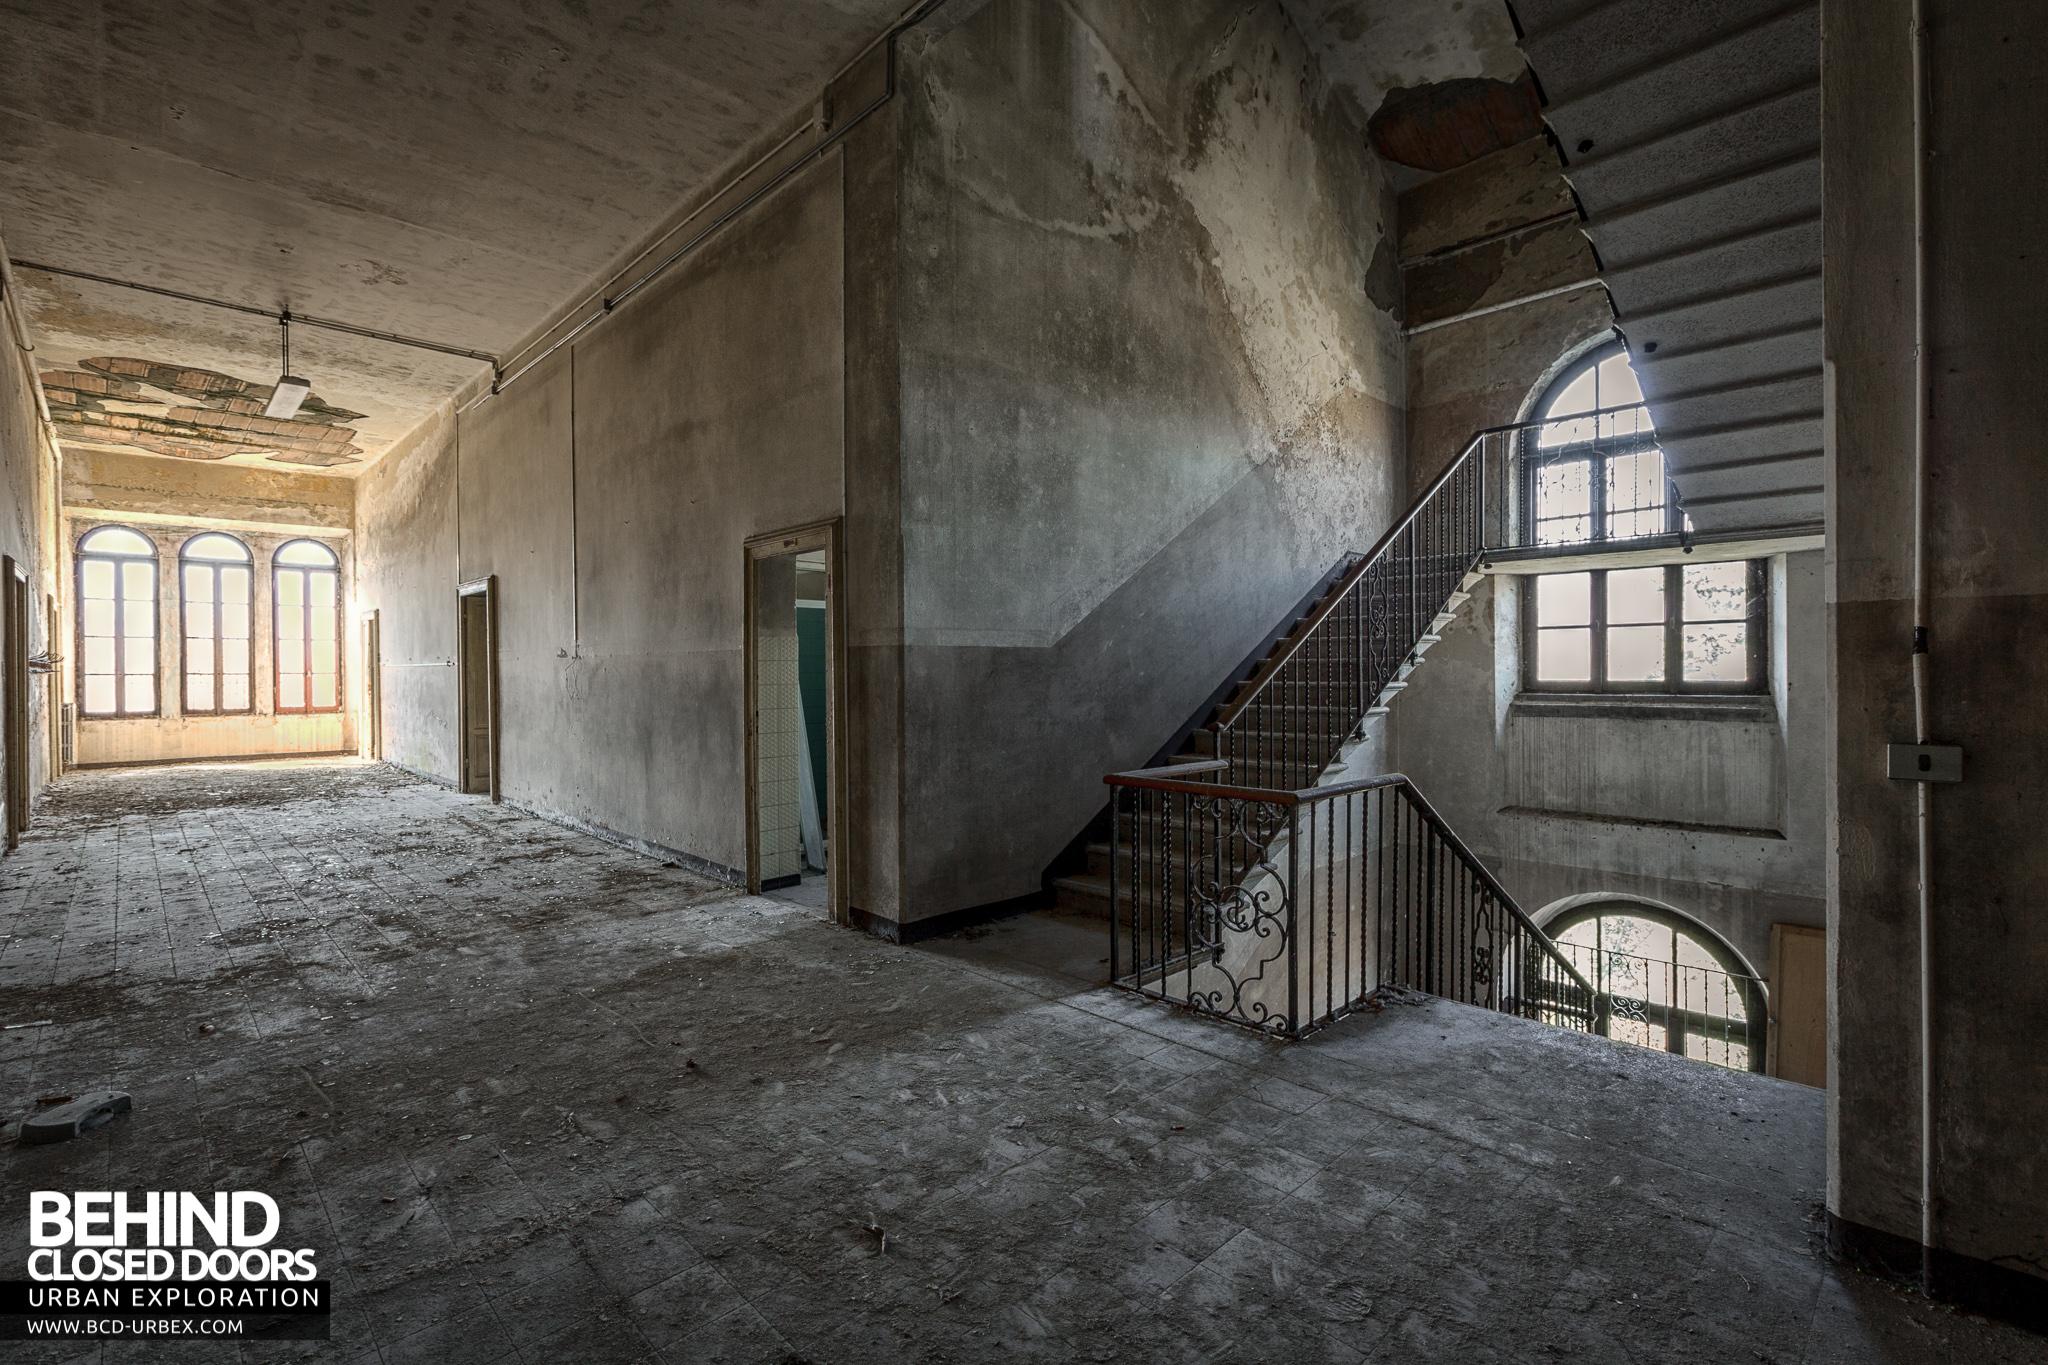 Blue Chapel Abandoned Monastery Italy 187 Urbex Behind